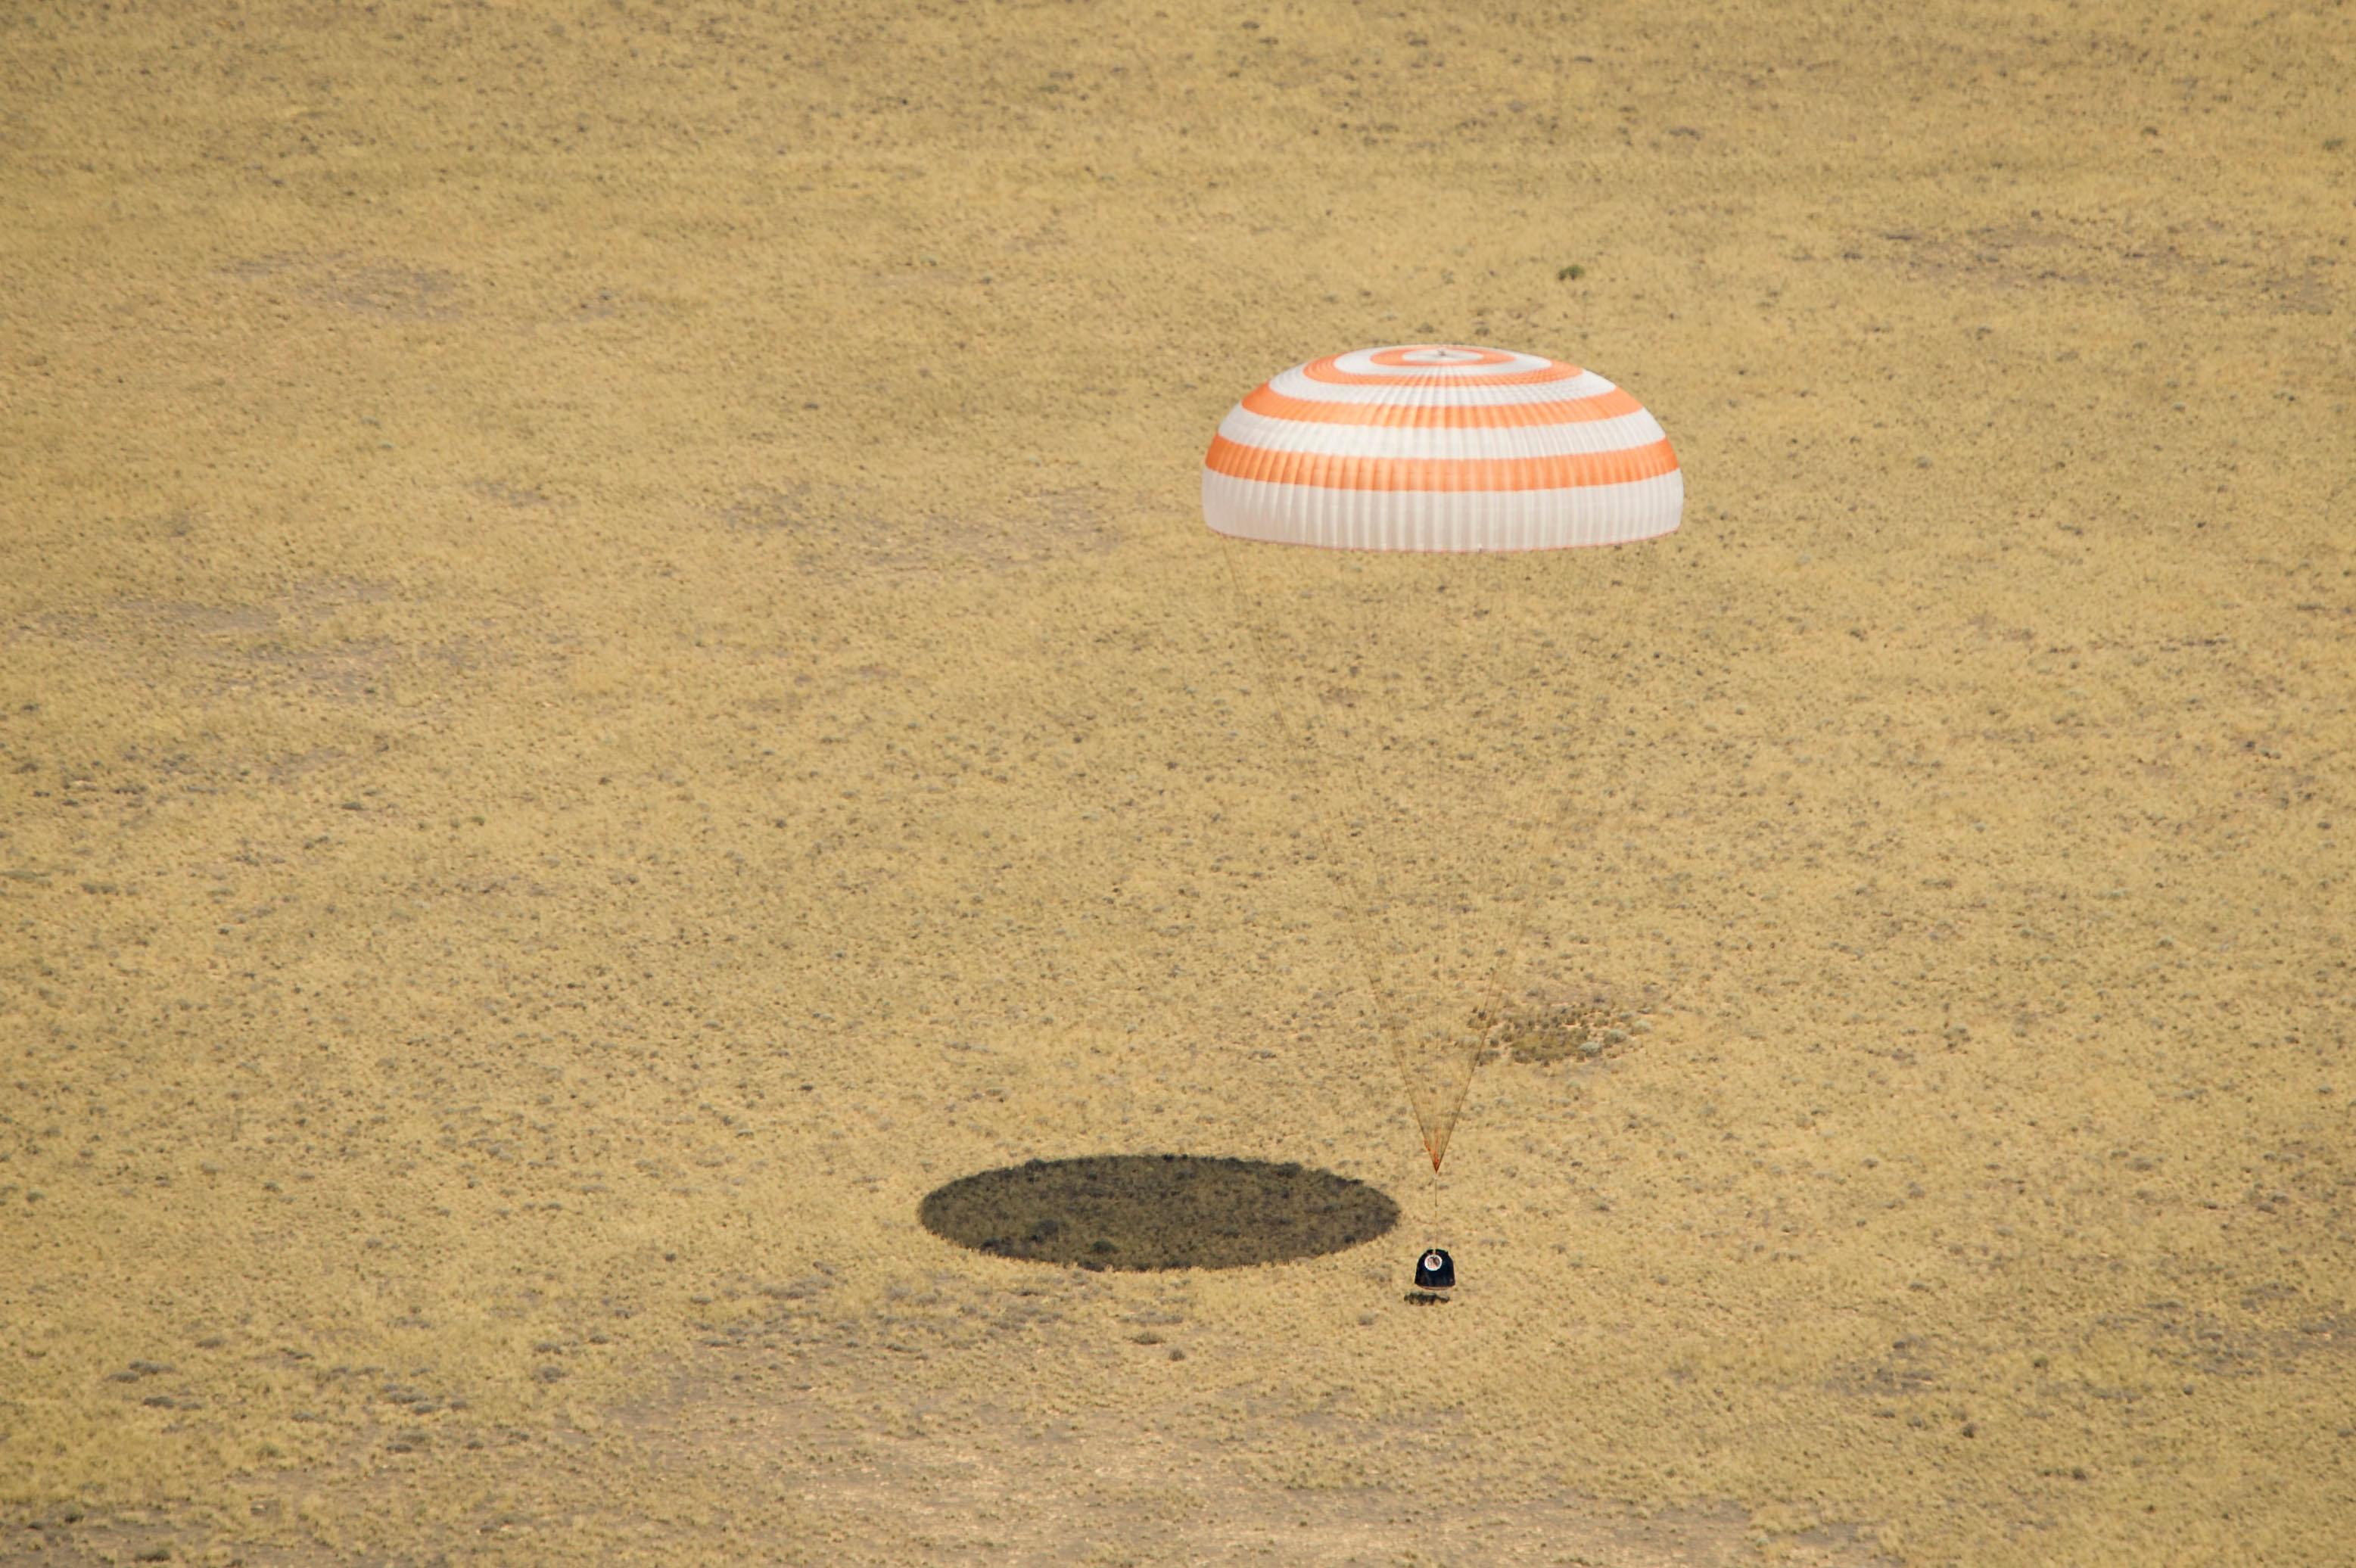 russian spacecraft landing - photo #3